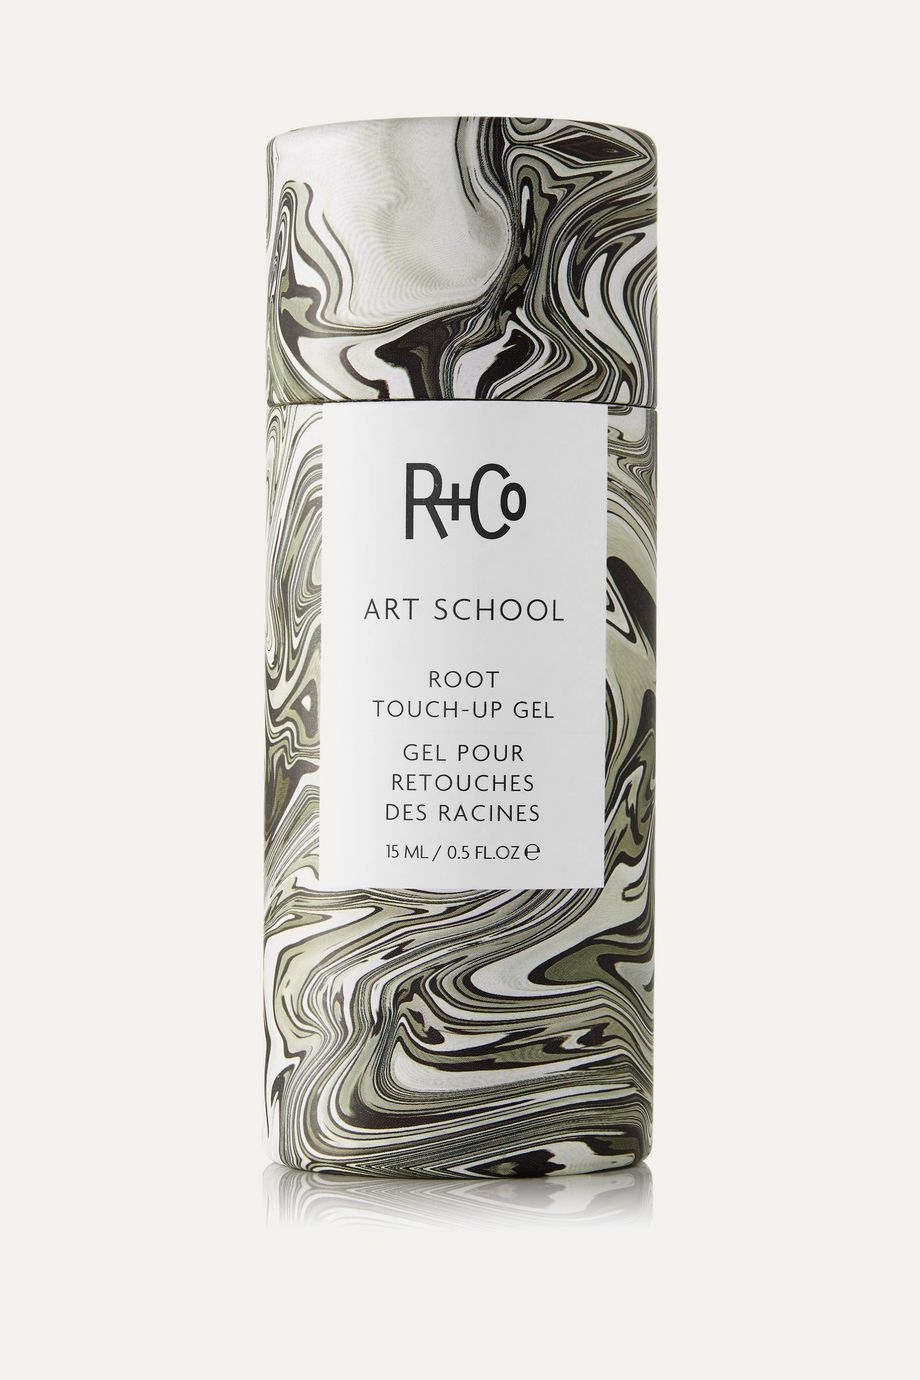 R+Co Art School Root Touch-Up Gel - Black, 15ml